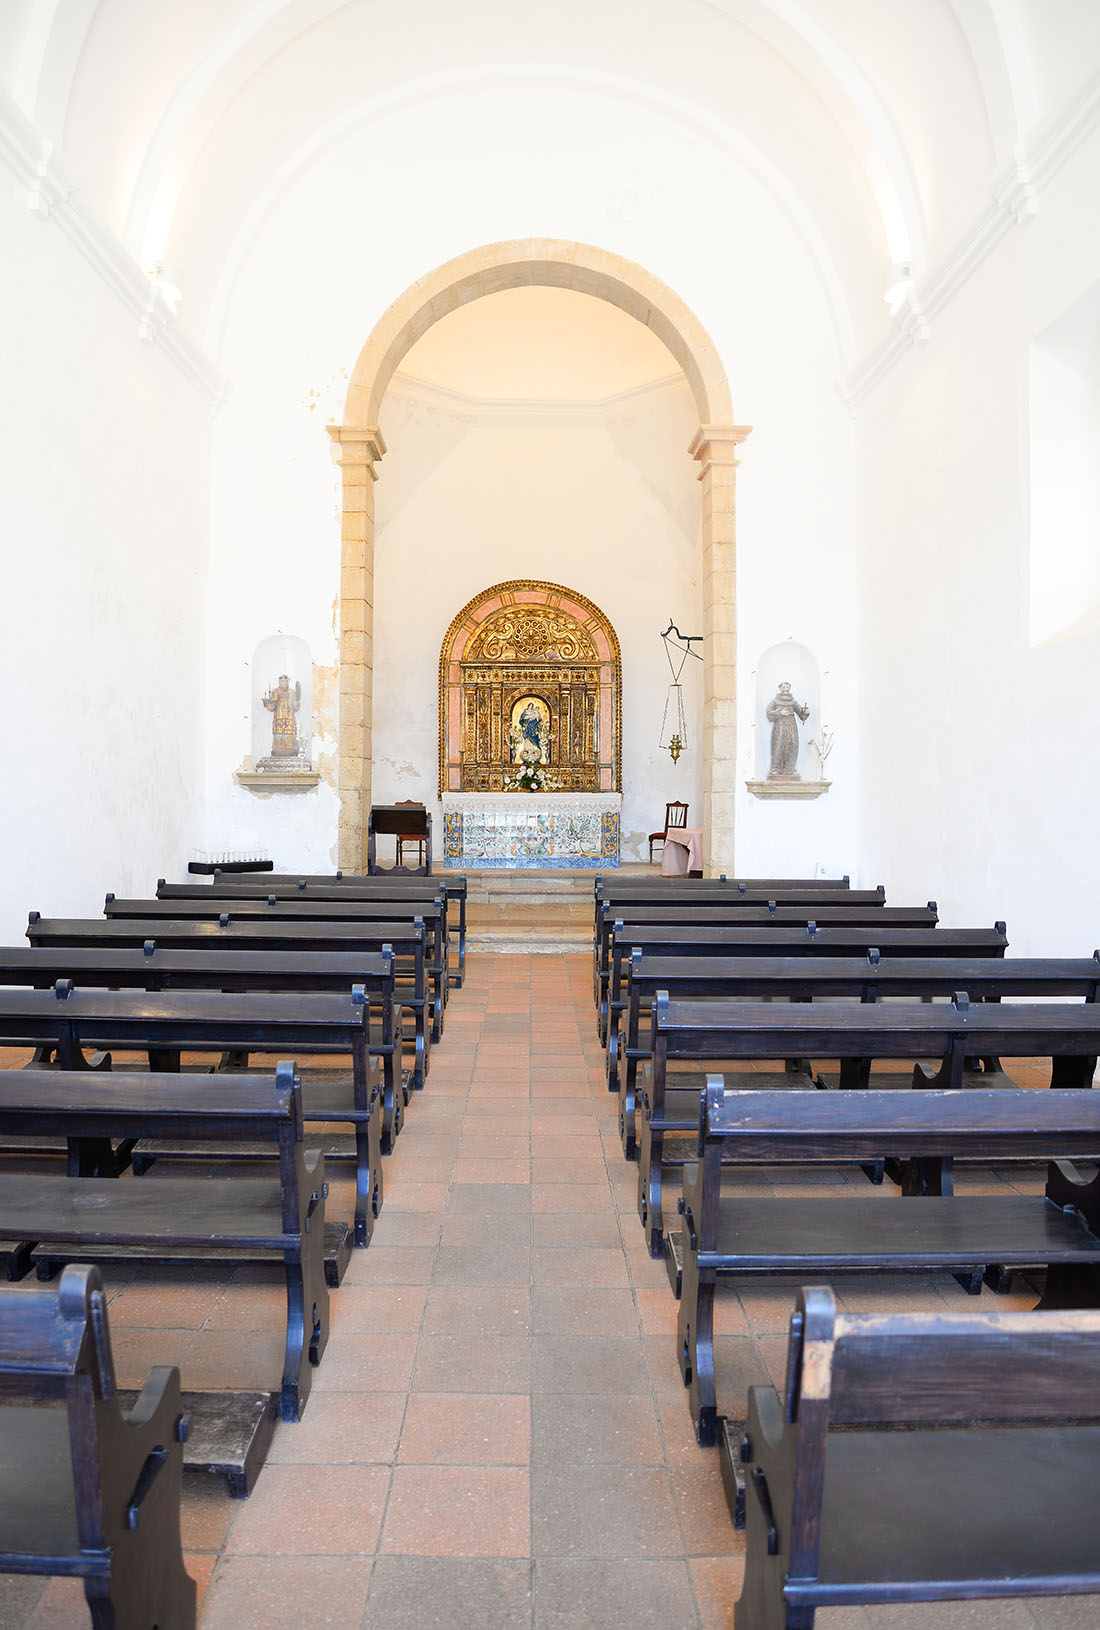 église paroissiale de Nossa Senhora de Graca, forteresse de sagres, algarve